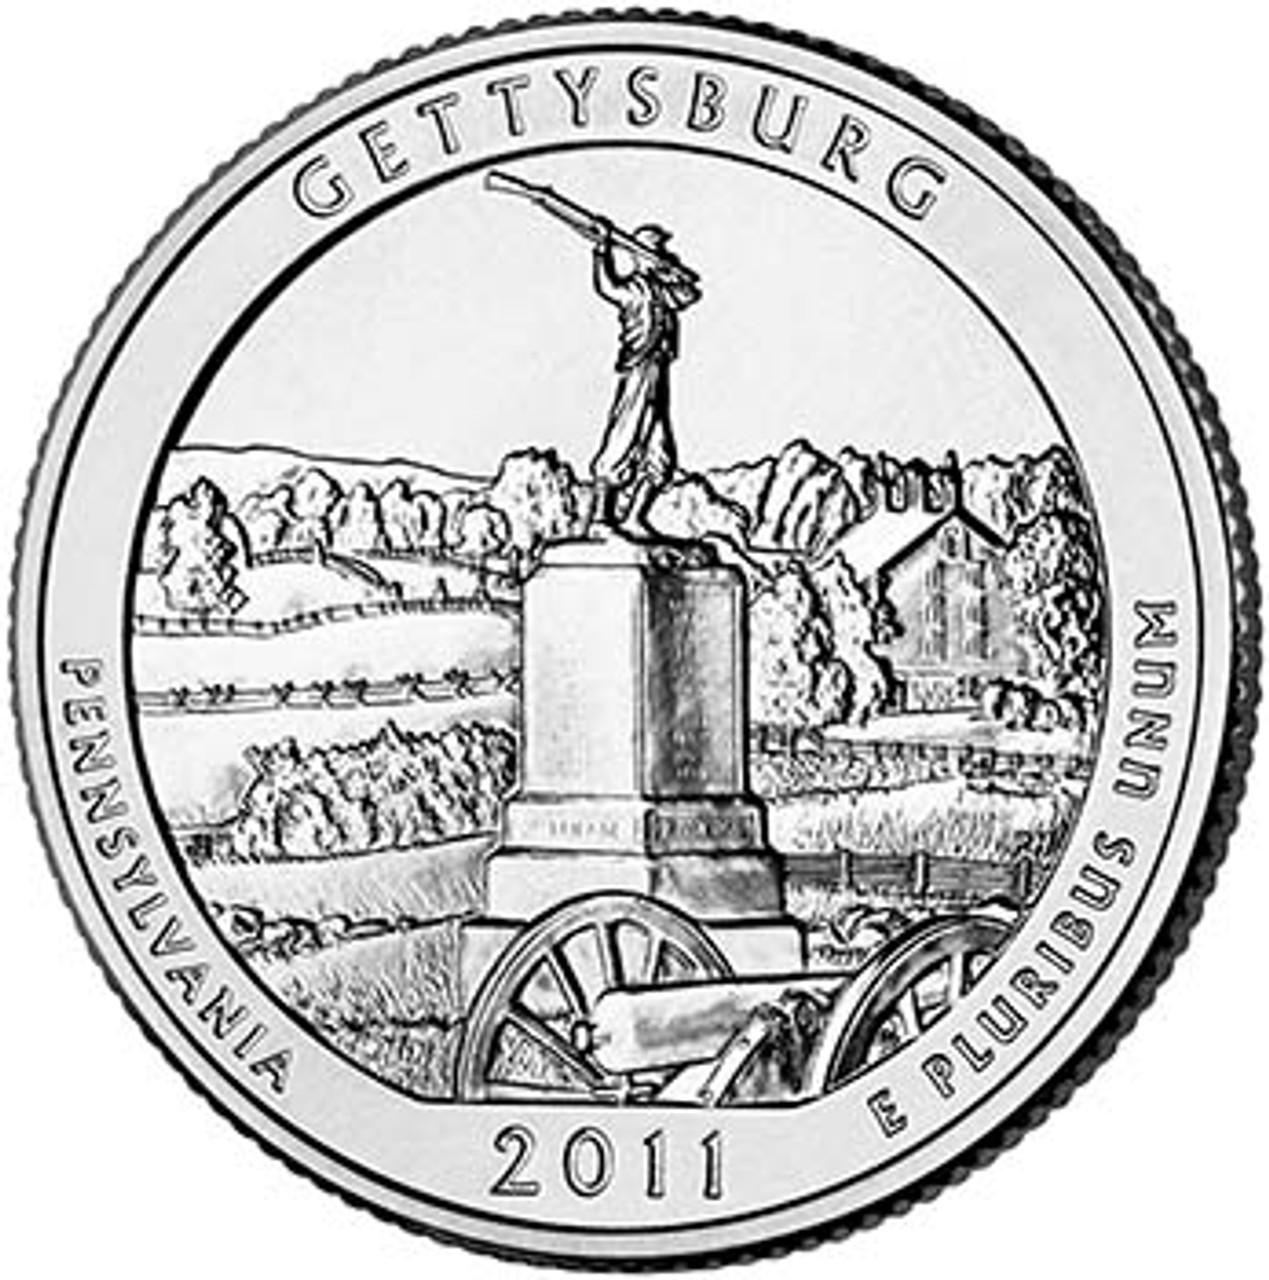 2011-D Gettysburg National Military Park Quarter Brilliant Uncirculated Image 1